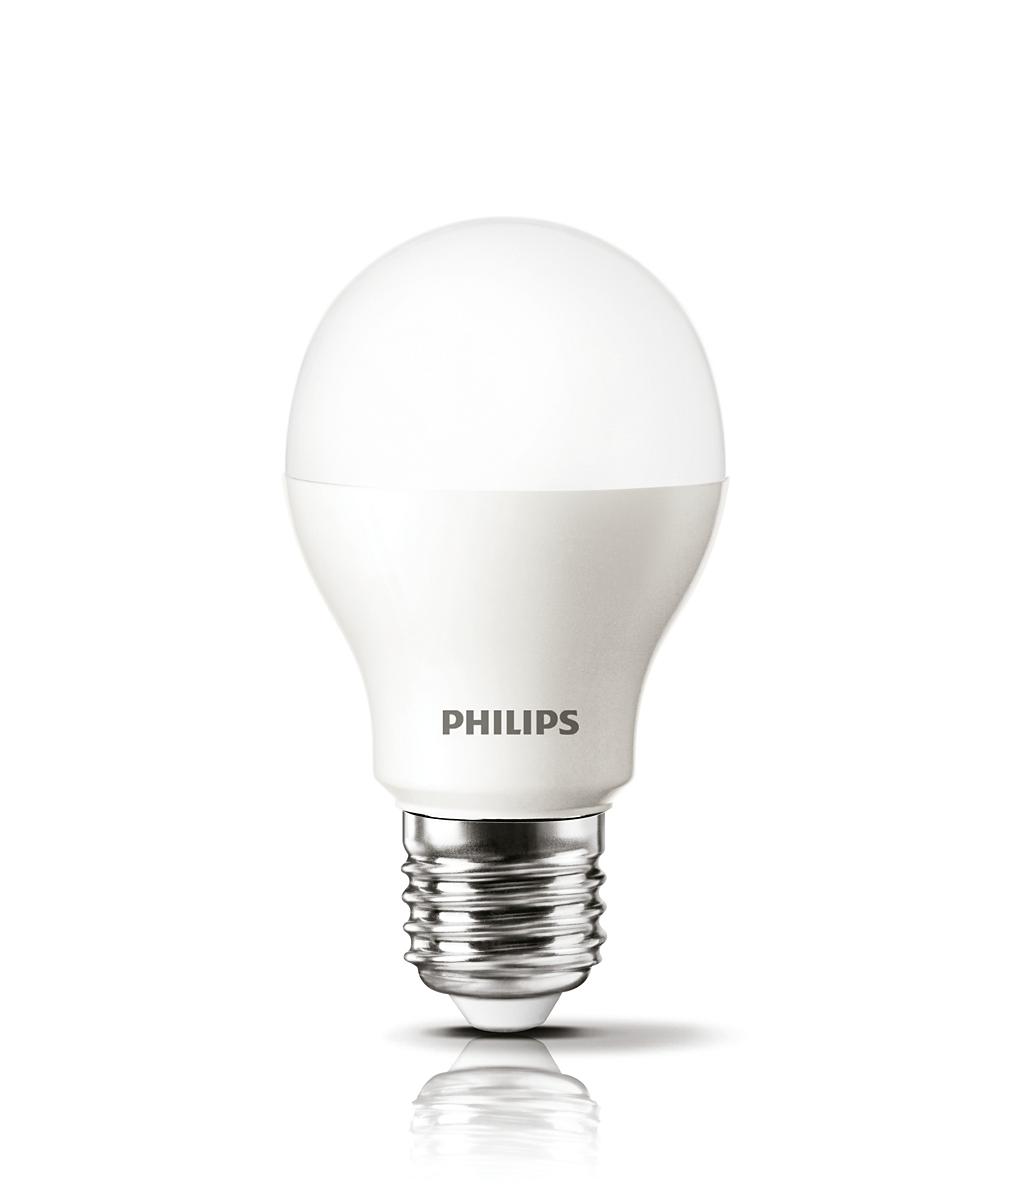 8 x Philips 6.5W 40W B22 BC Bayonet Cap LED Lamps Bulbs 2700K Warm White